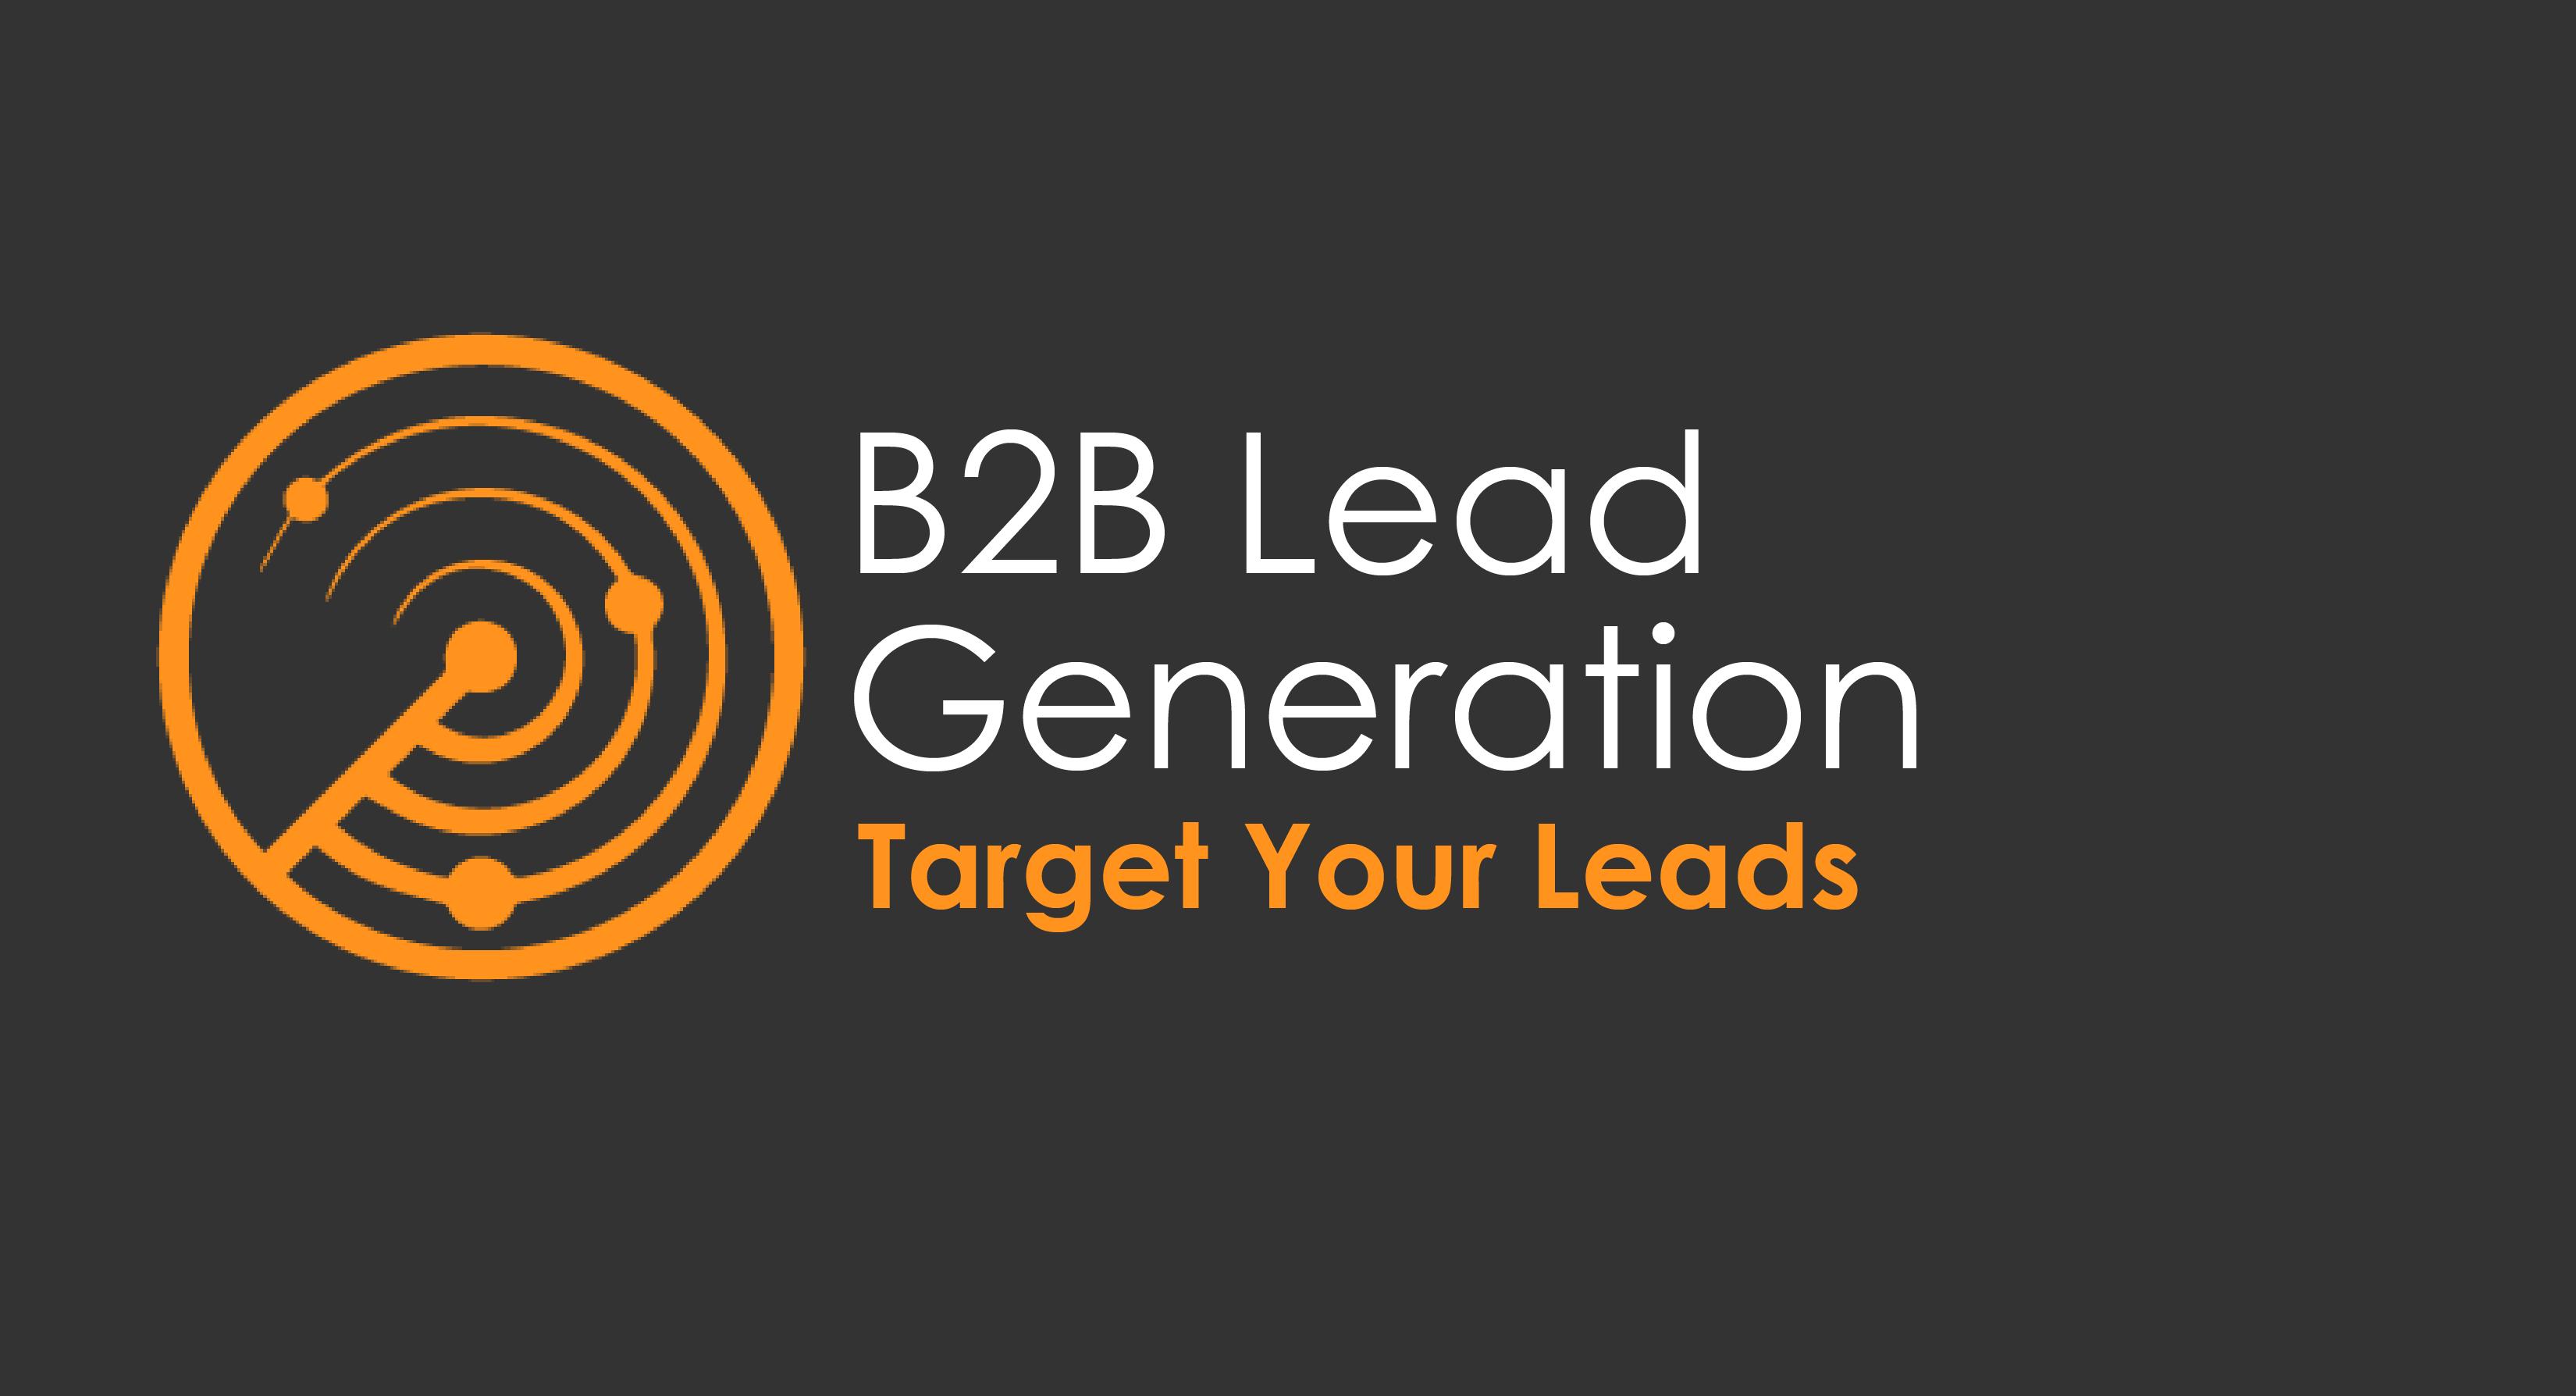 B2b lead generation companies in usa